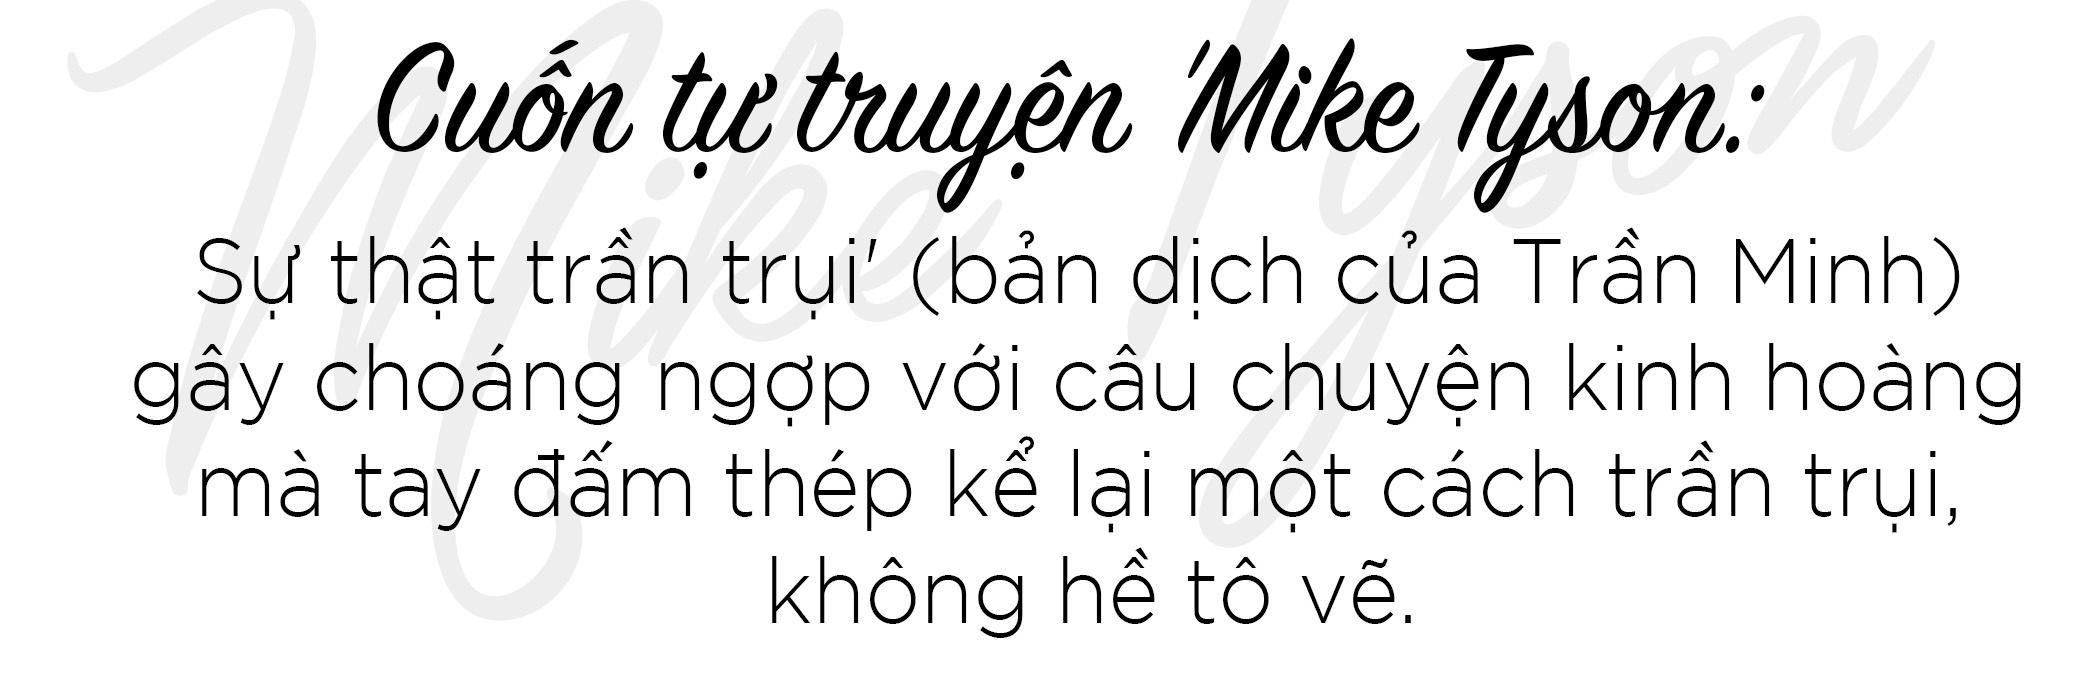 Mike Tyson - Su that tran trui: Quyen Anh, ma tuy, gai va su huy hoai hinh anh 2